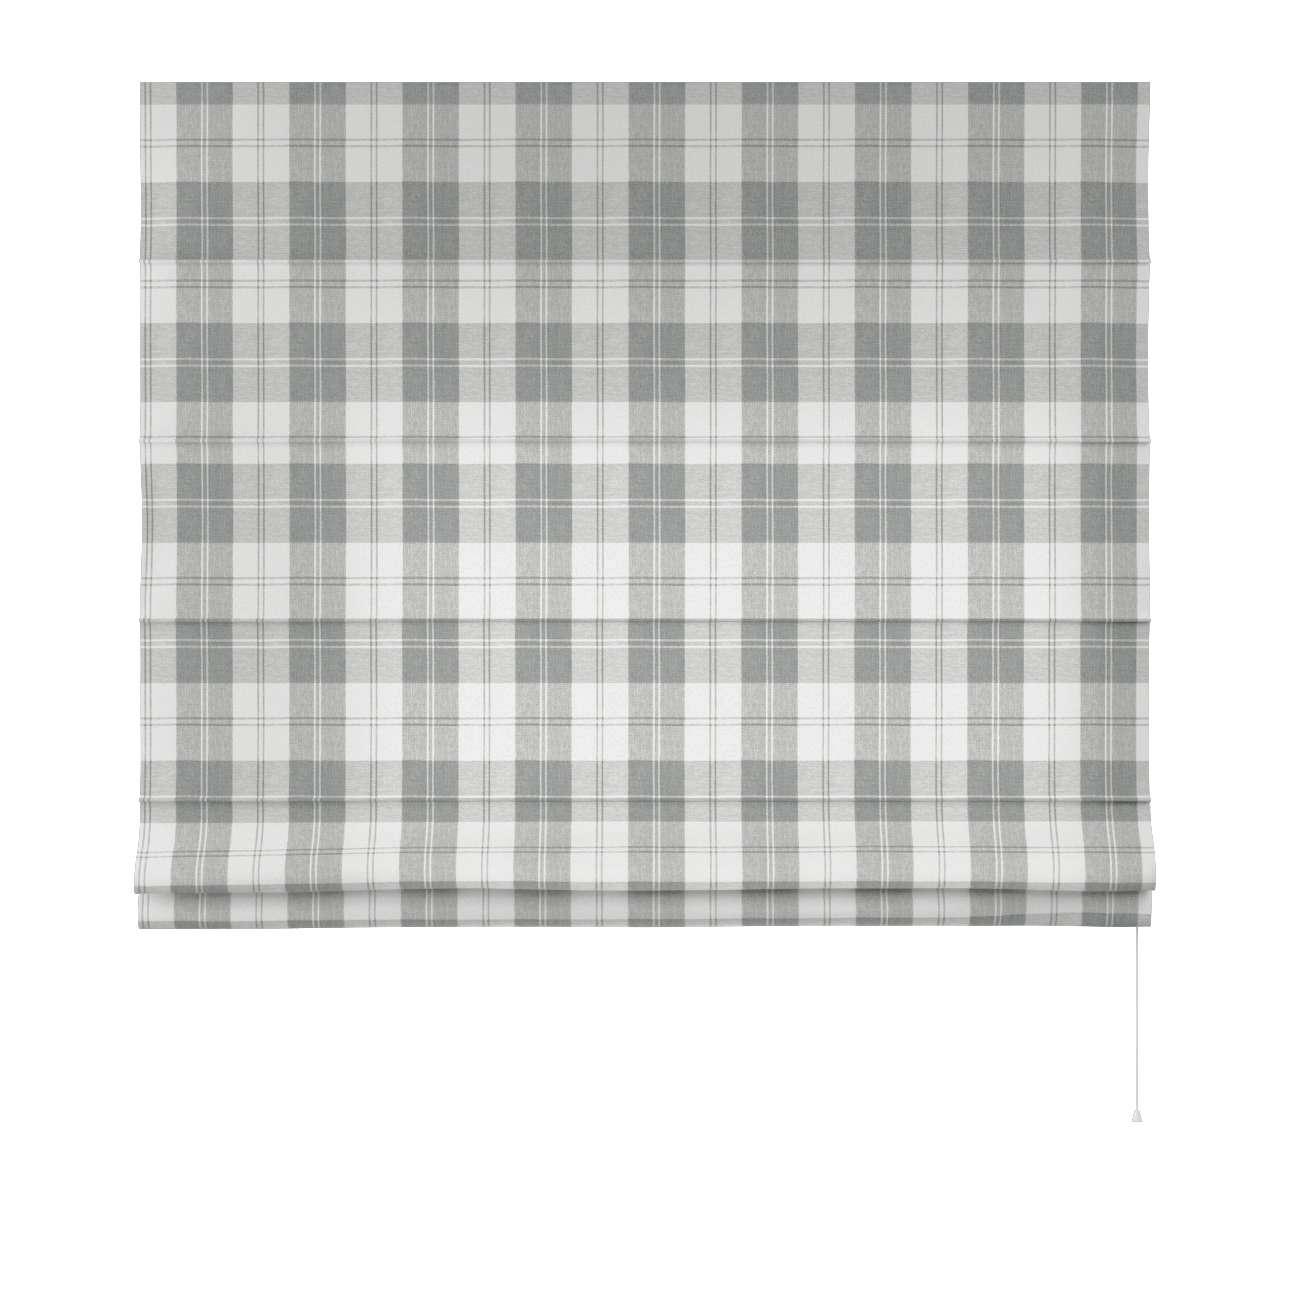 Foldegardin Capri<br/>Uden flæsekant 80 x 170 cm fra kollektionen Edinburgh, Stof: 115-79